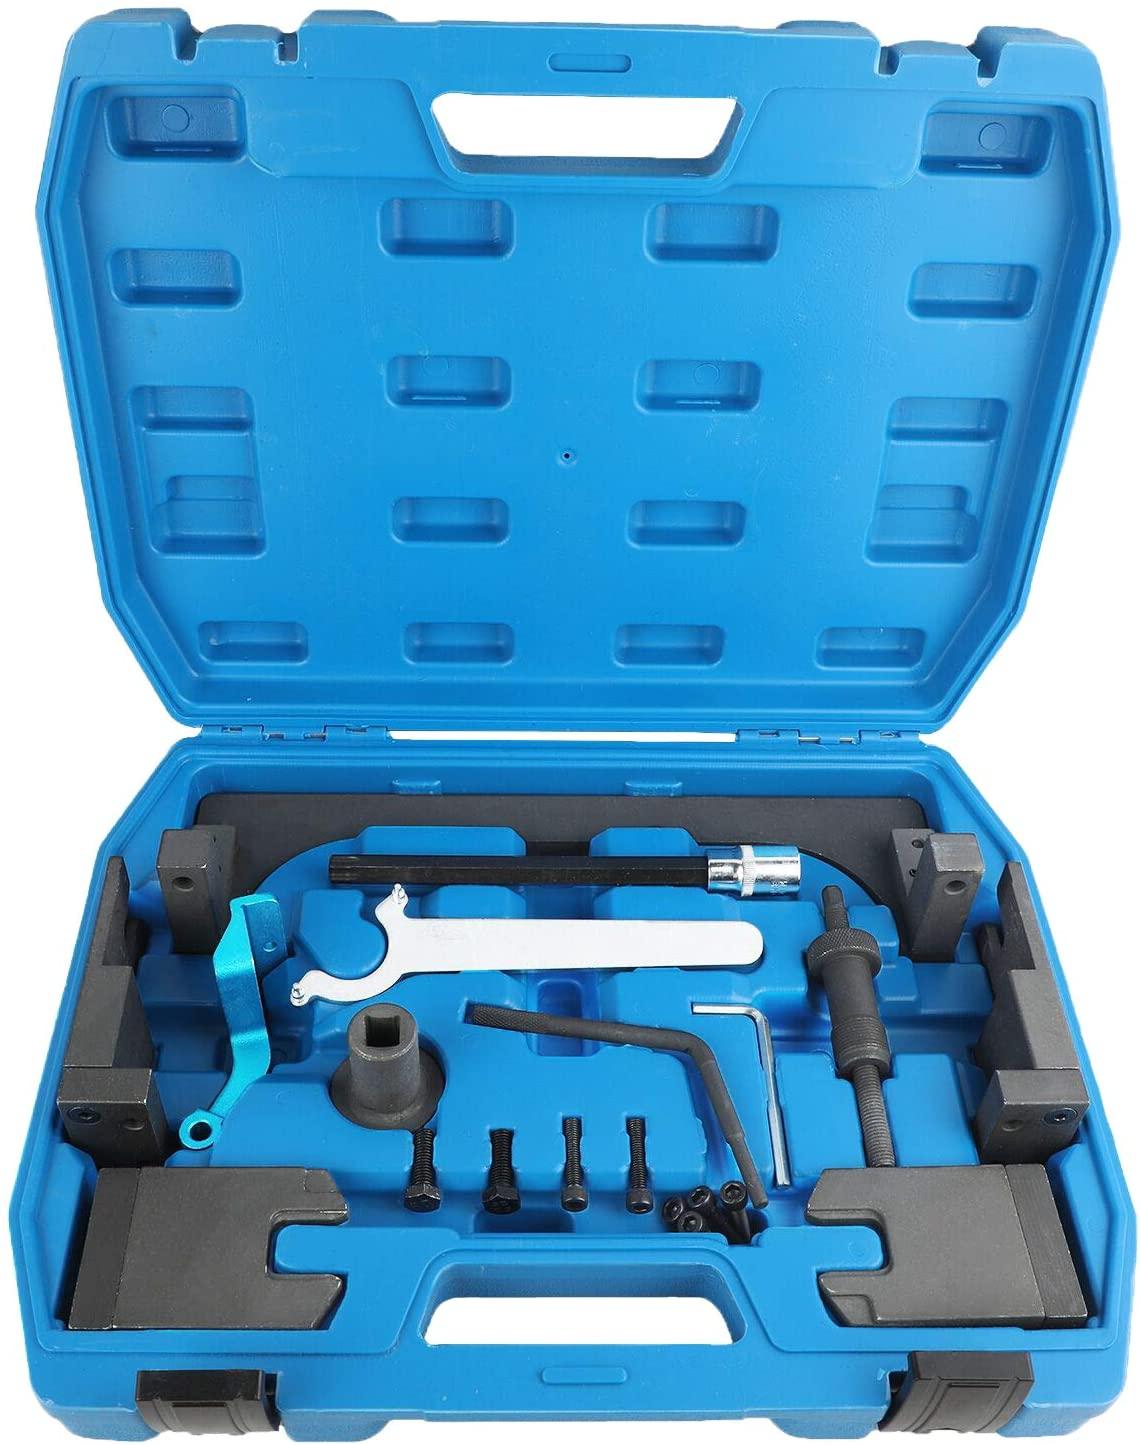 Mrcartool Engine Camshaft Alignment Timing Tool Set for BMW Mini B38 A15 A12 B48 A20 B58